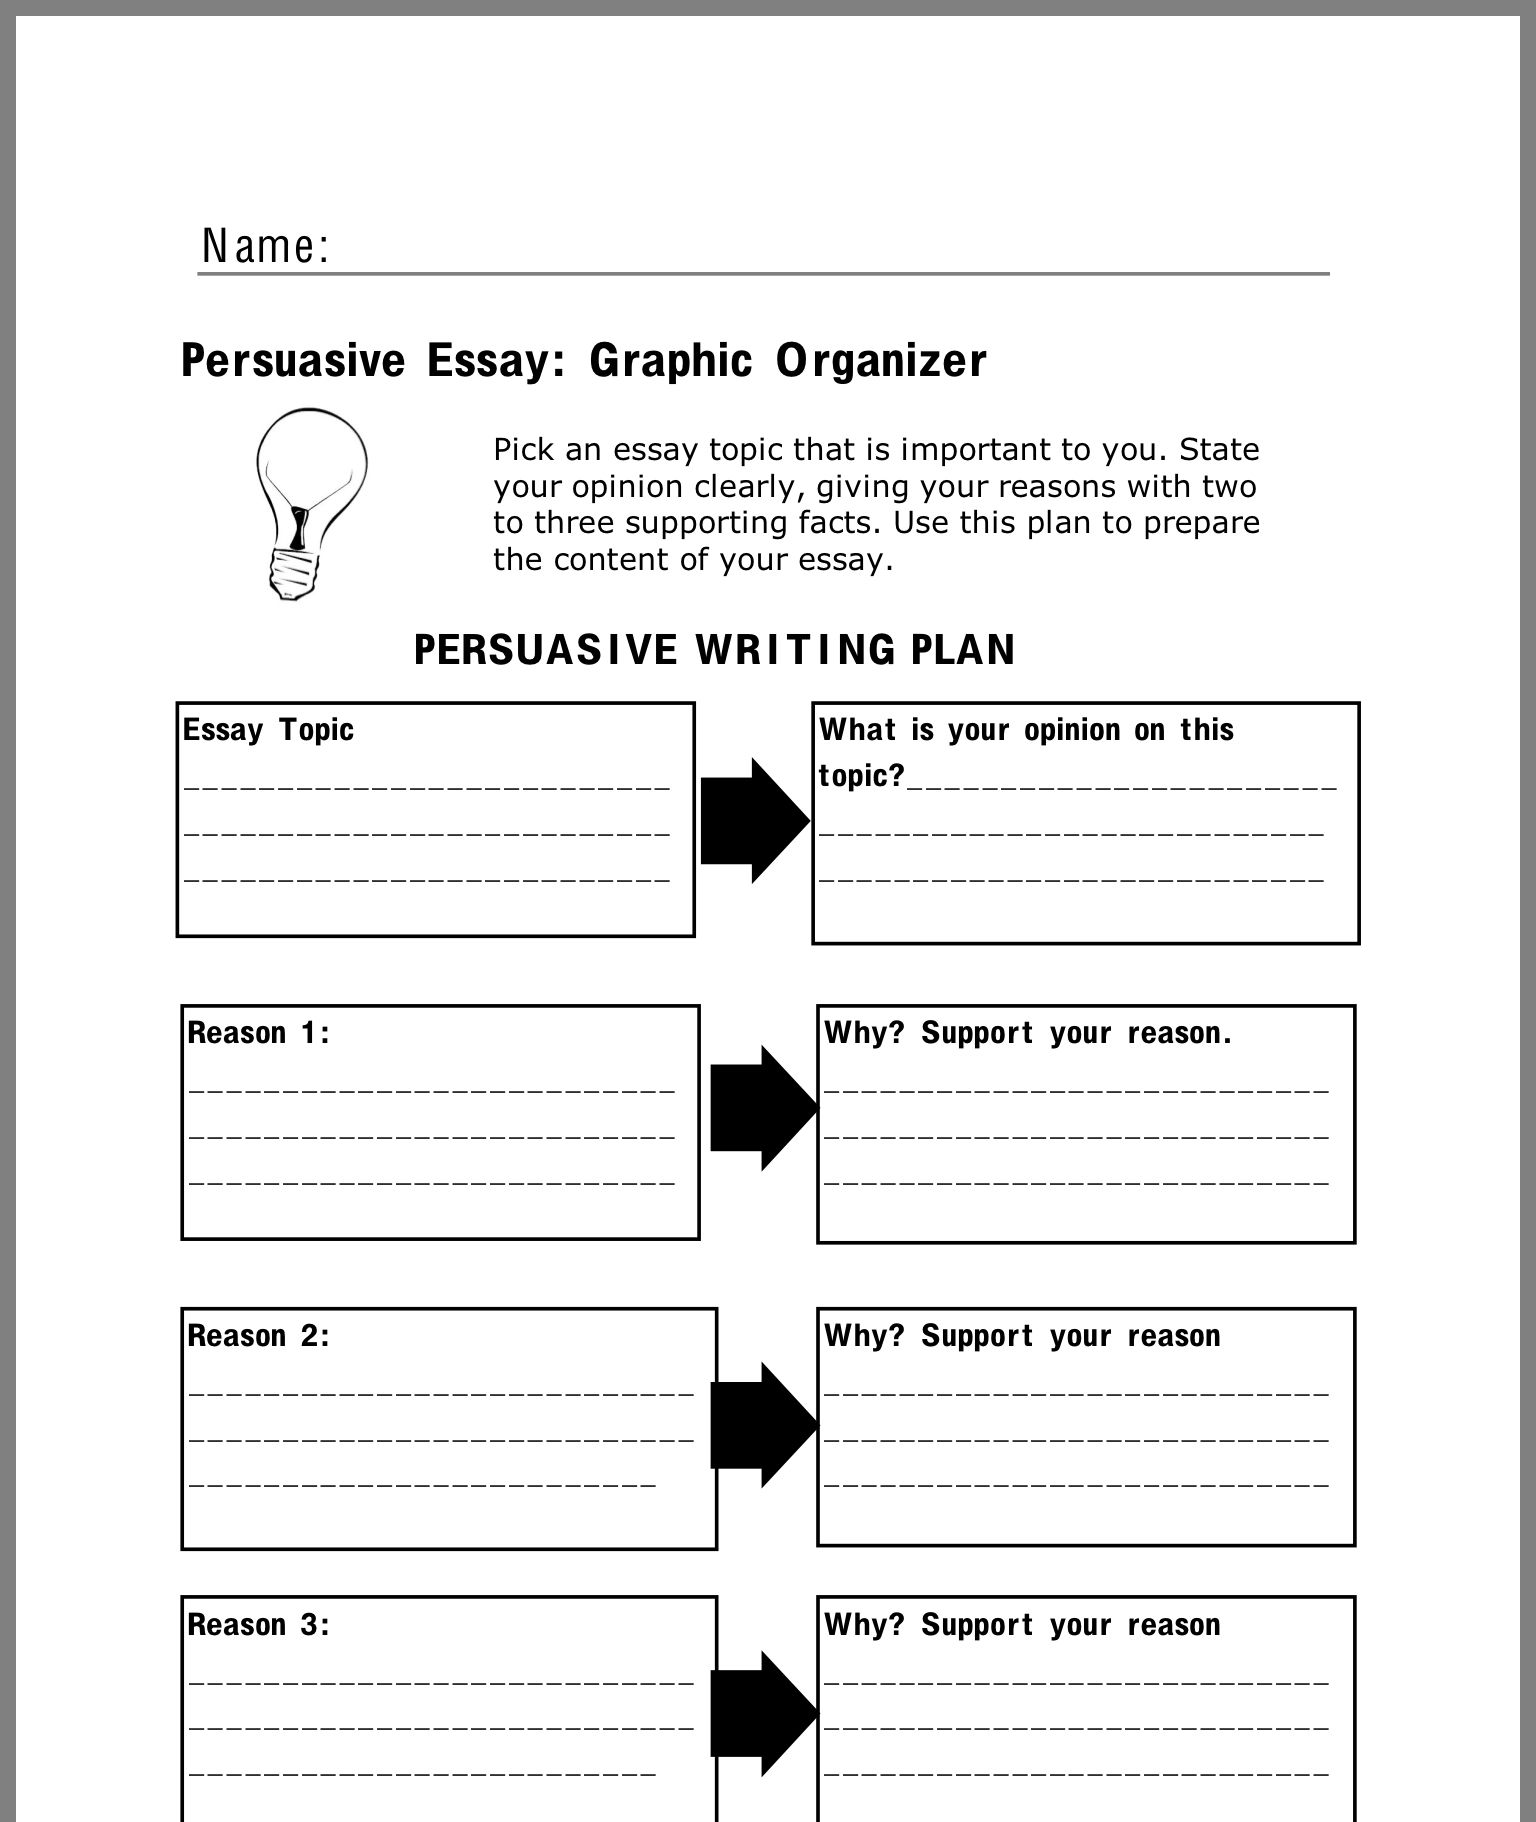 Pin By Jackson On School Persuasive Writing Persuasive Writing Graphic Organizer Writing Lessons [ 1822 x 1536 Pixel ]